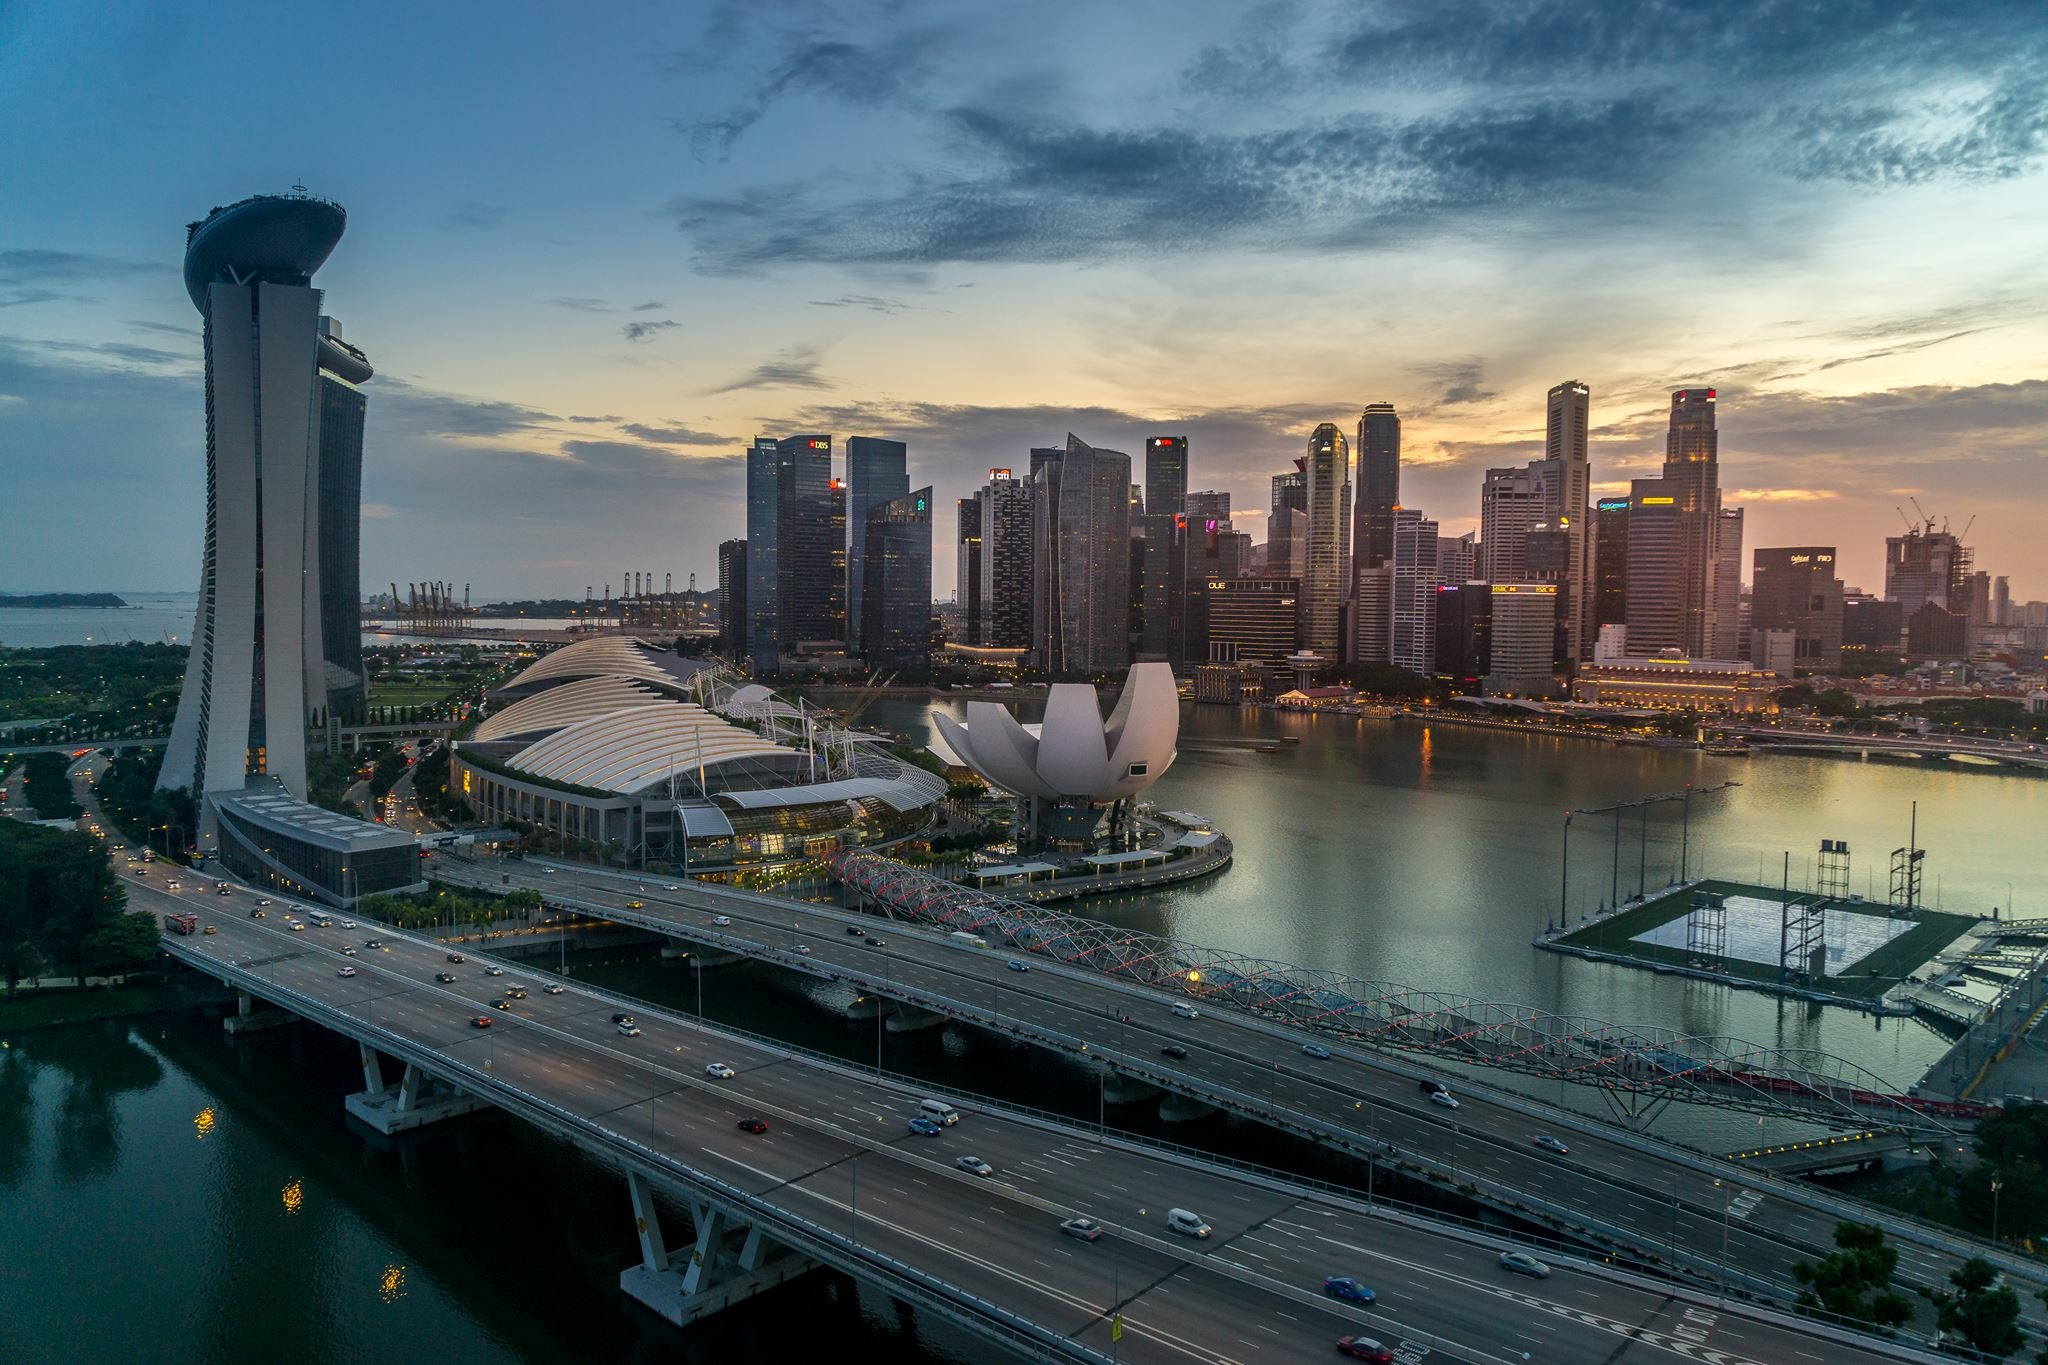 Big wheel view, Singapore